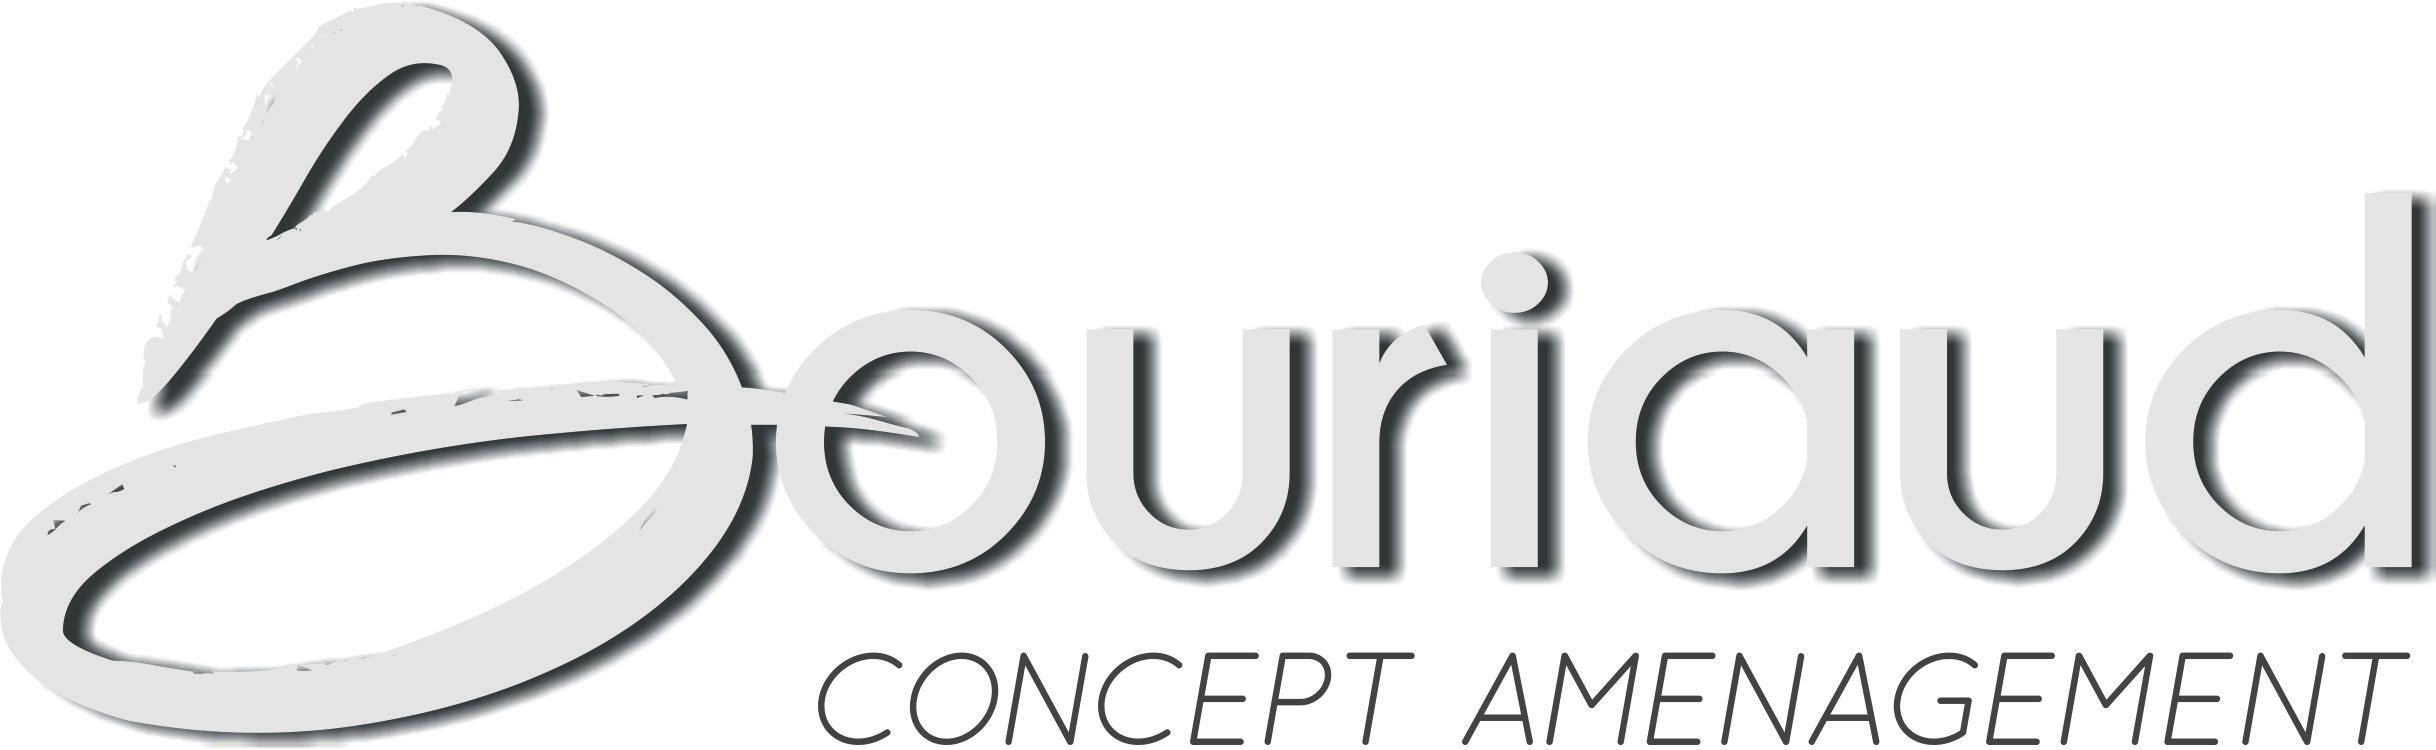 Bouriaud Concept Aménagement – Terassement & Jardin – Pornic & Côte de Jade